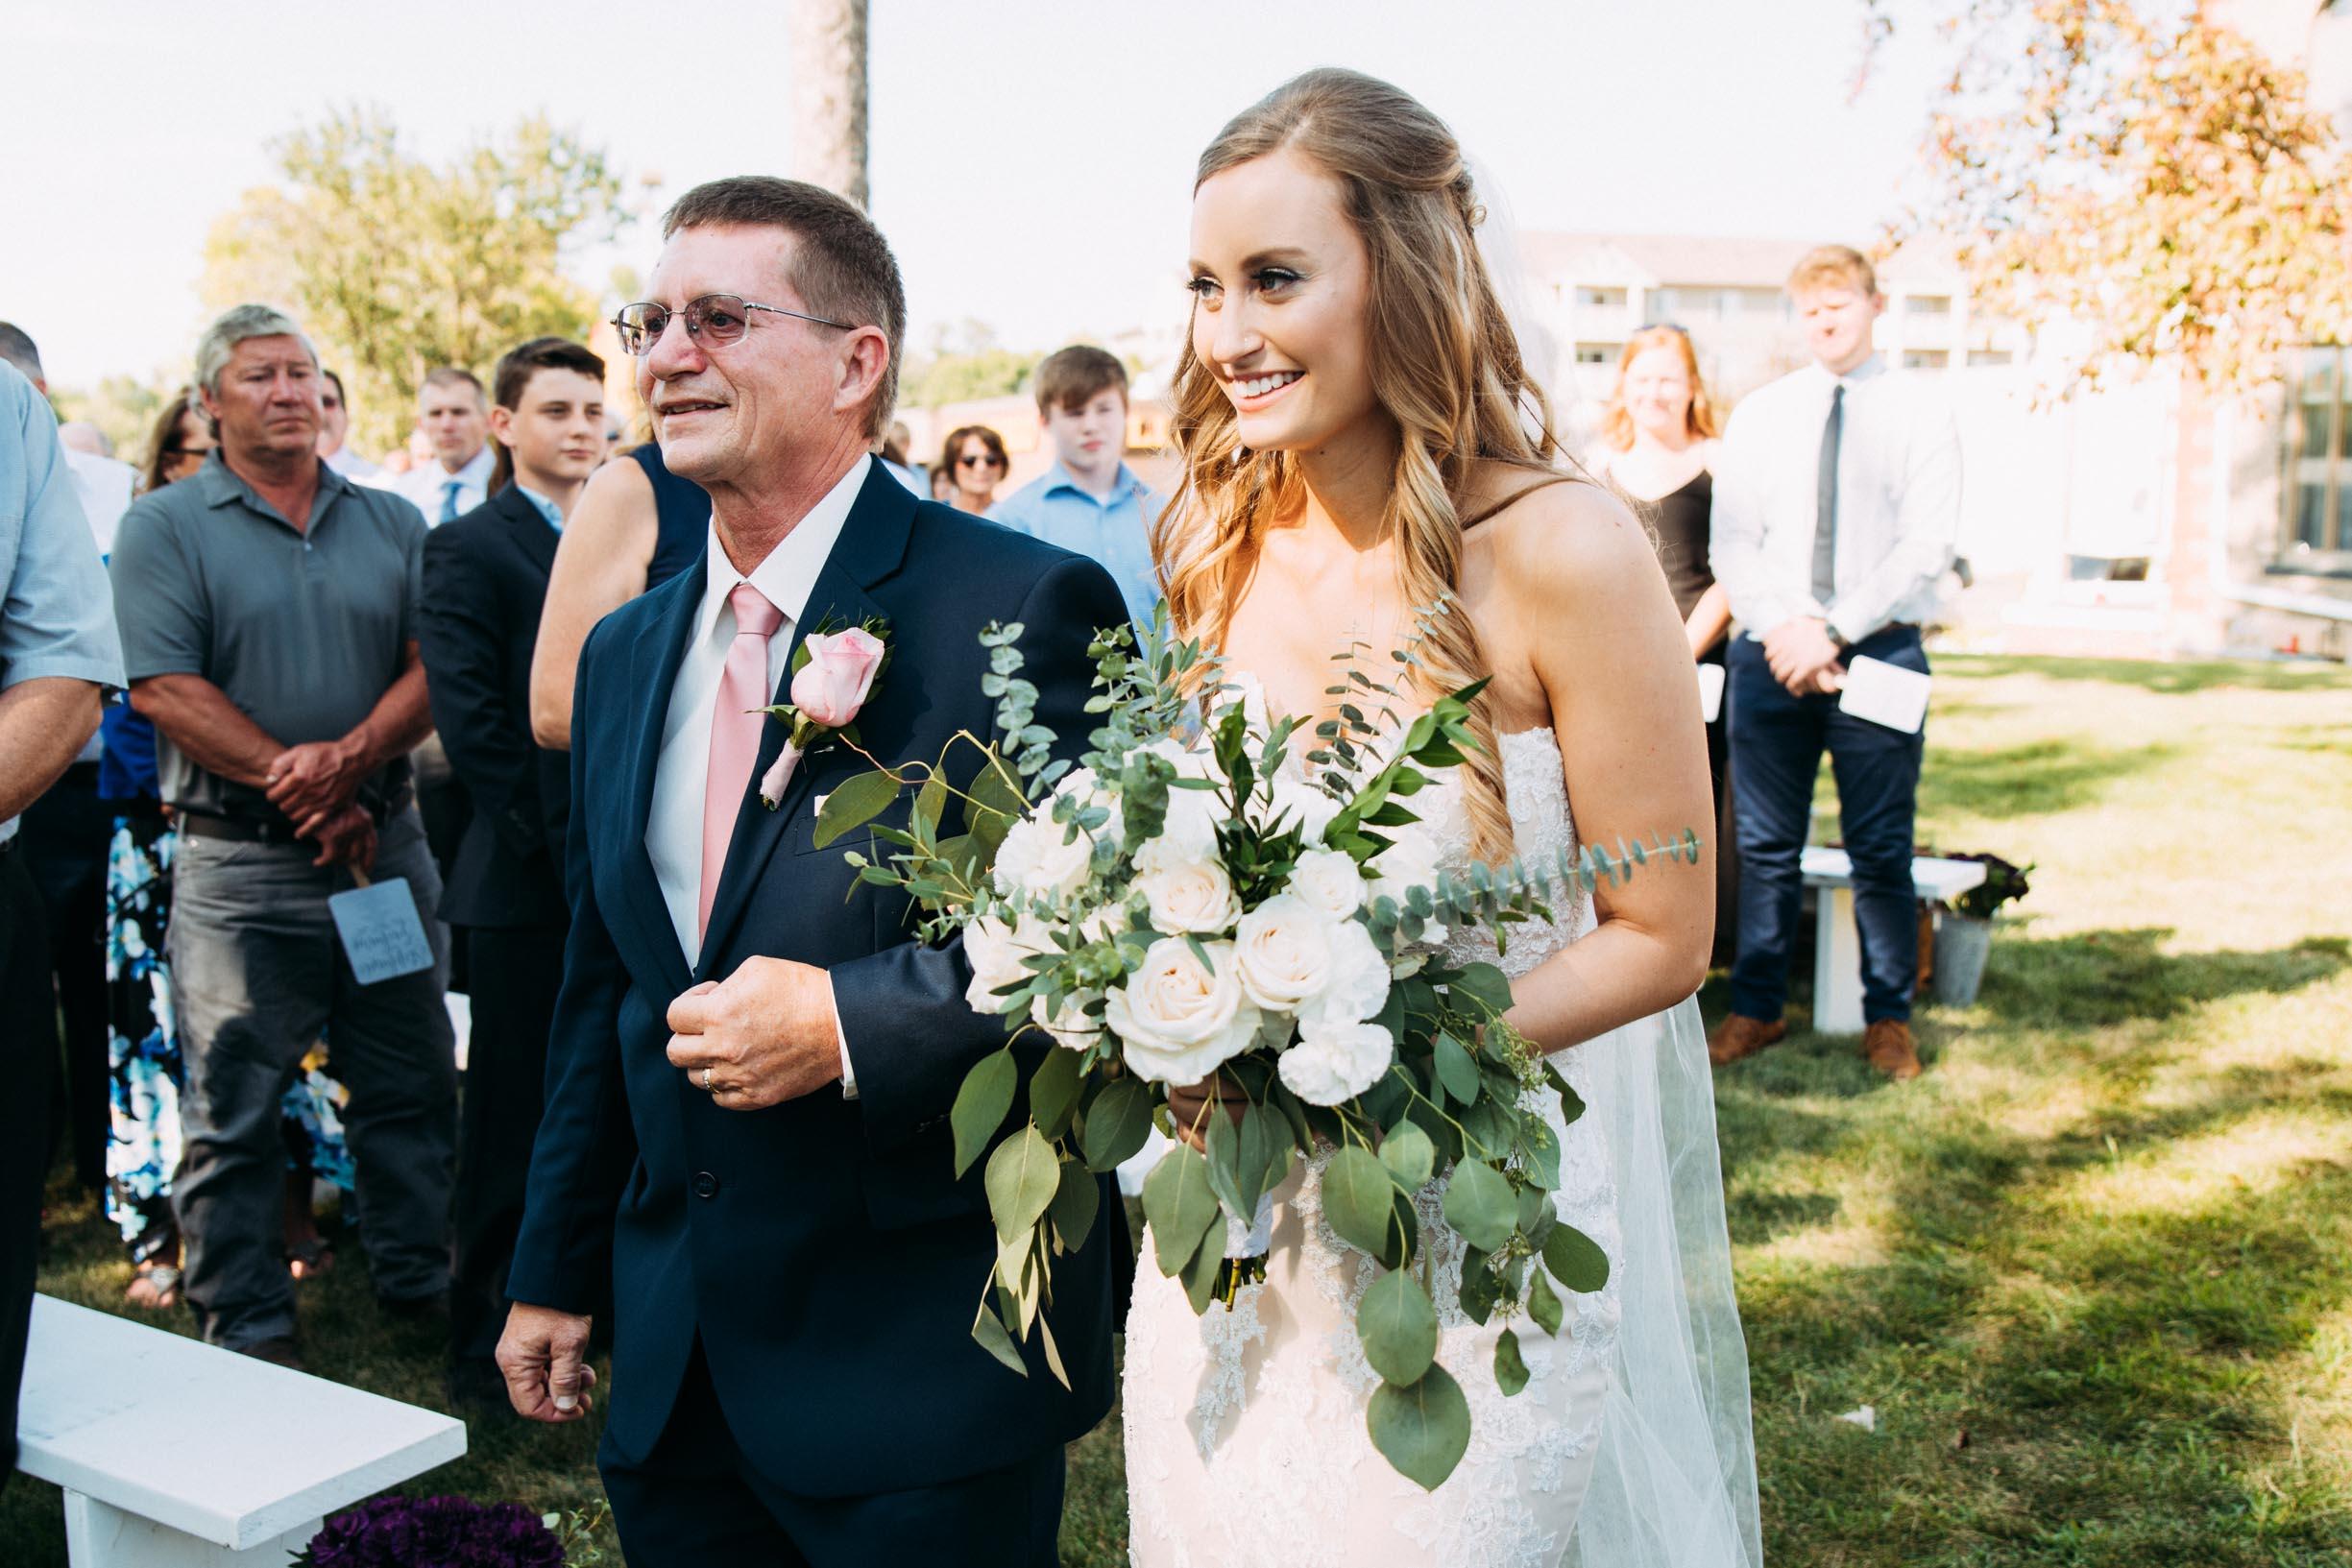 55-WeddingsattheBroz_Minnesota_WeddingBlog_Ceremony.jpg